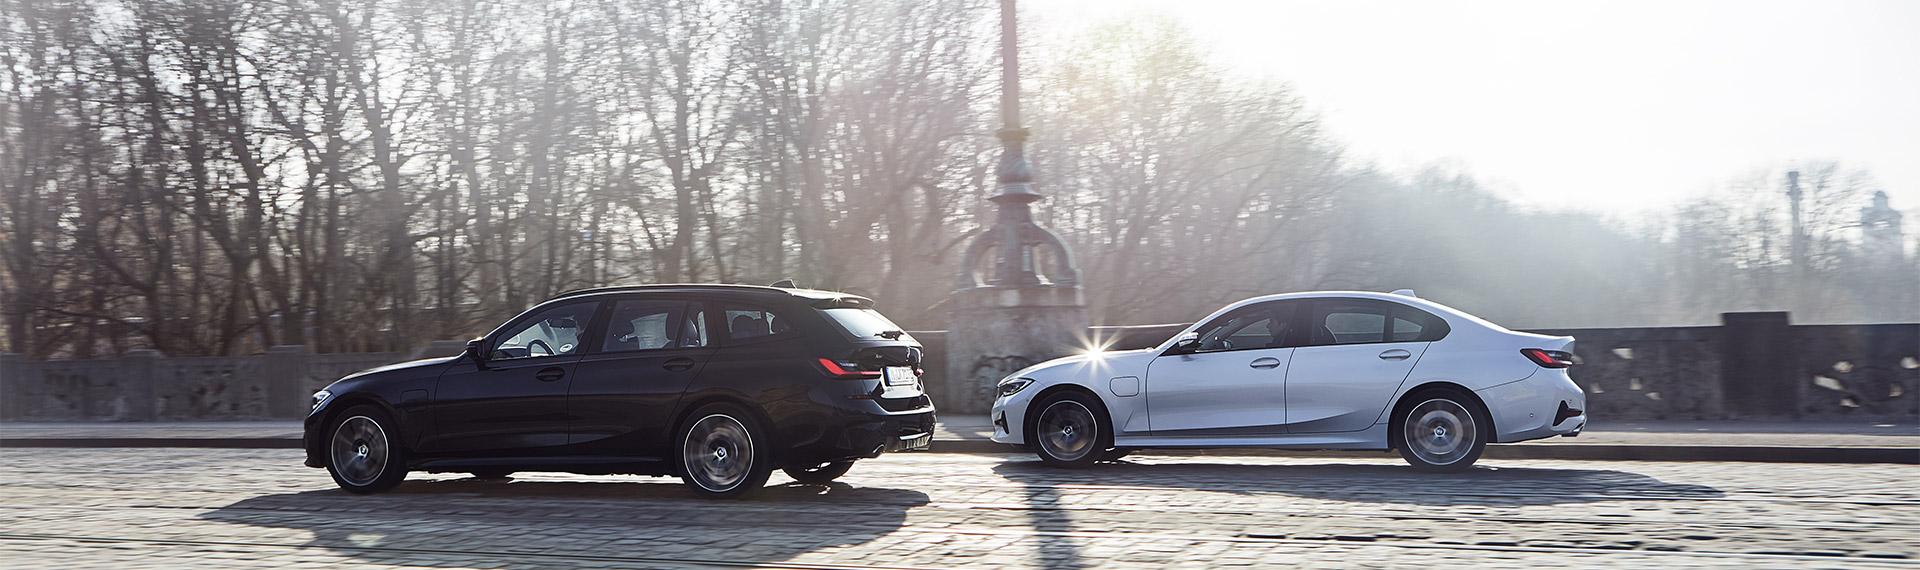 BMW 3 Series Touring Plug-in Hybrid and BMW 3 Series Saloon Plug-in Hybrid